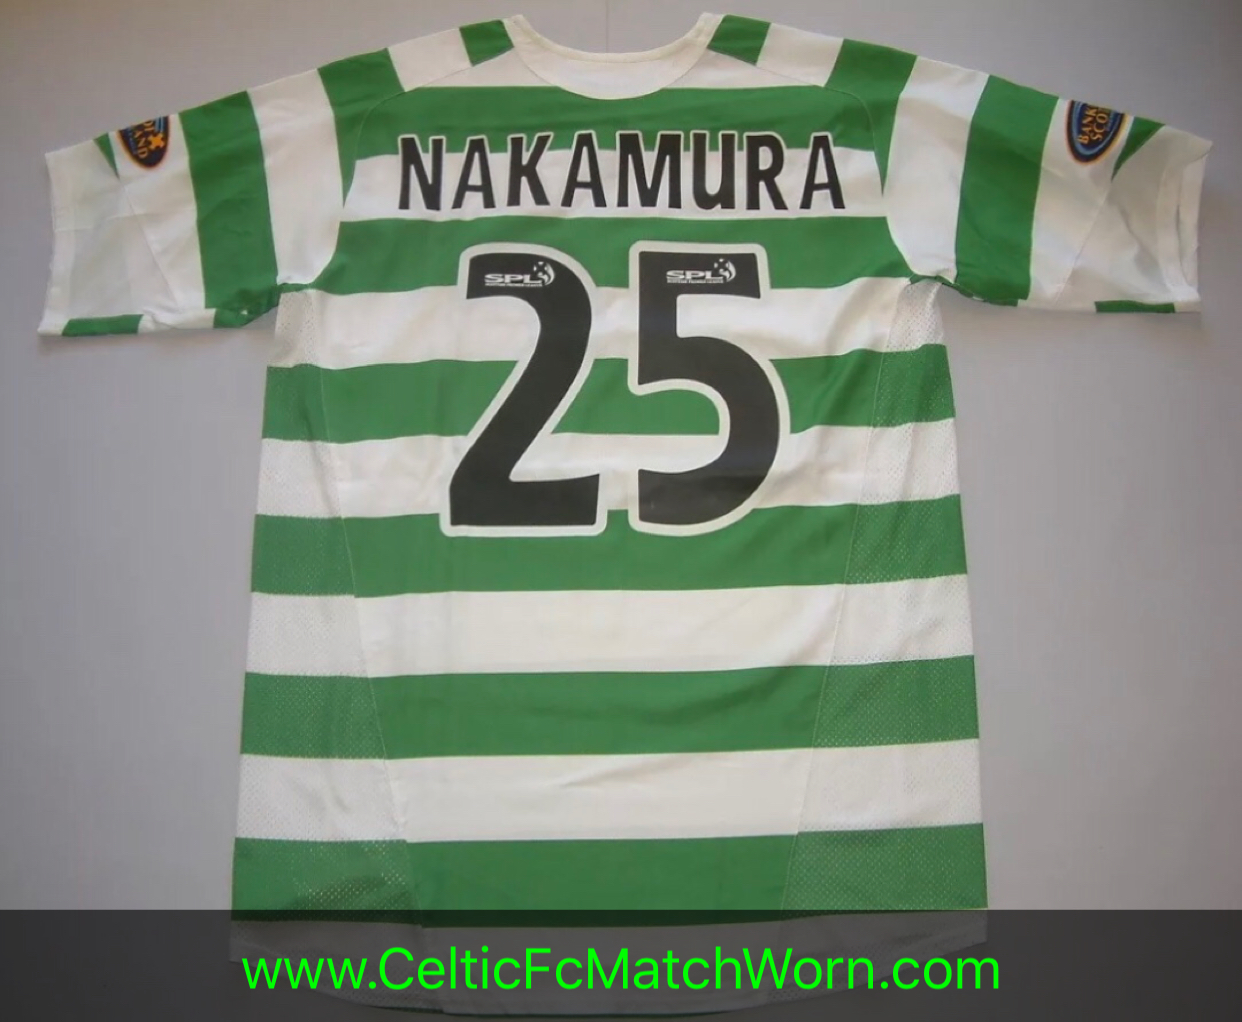 check out 45576 12b5c Shunsuke Nakamura 2005-2007 Home – Celtic FC Match Worn ⭐️